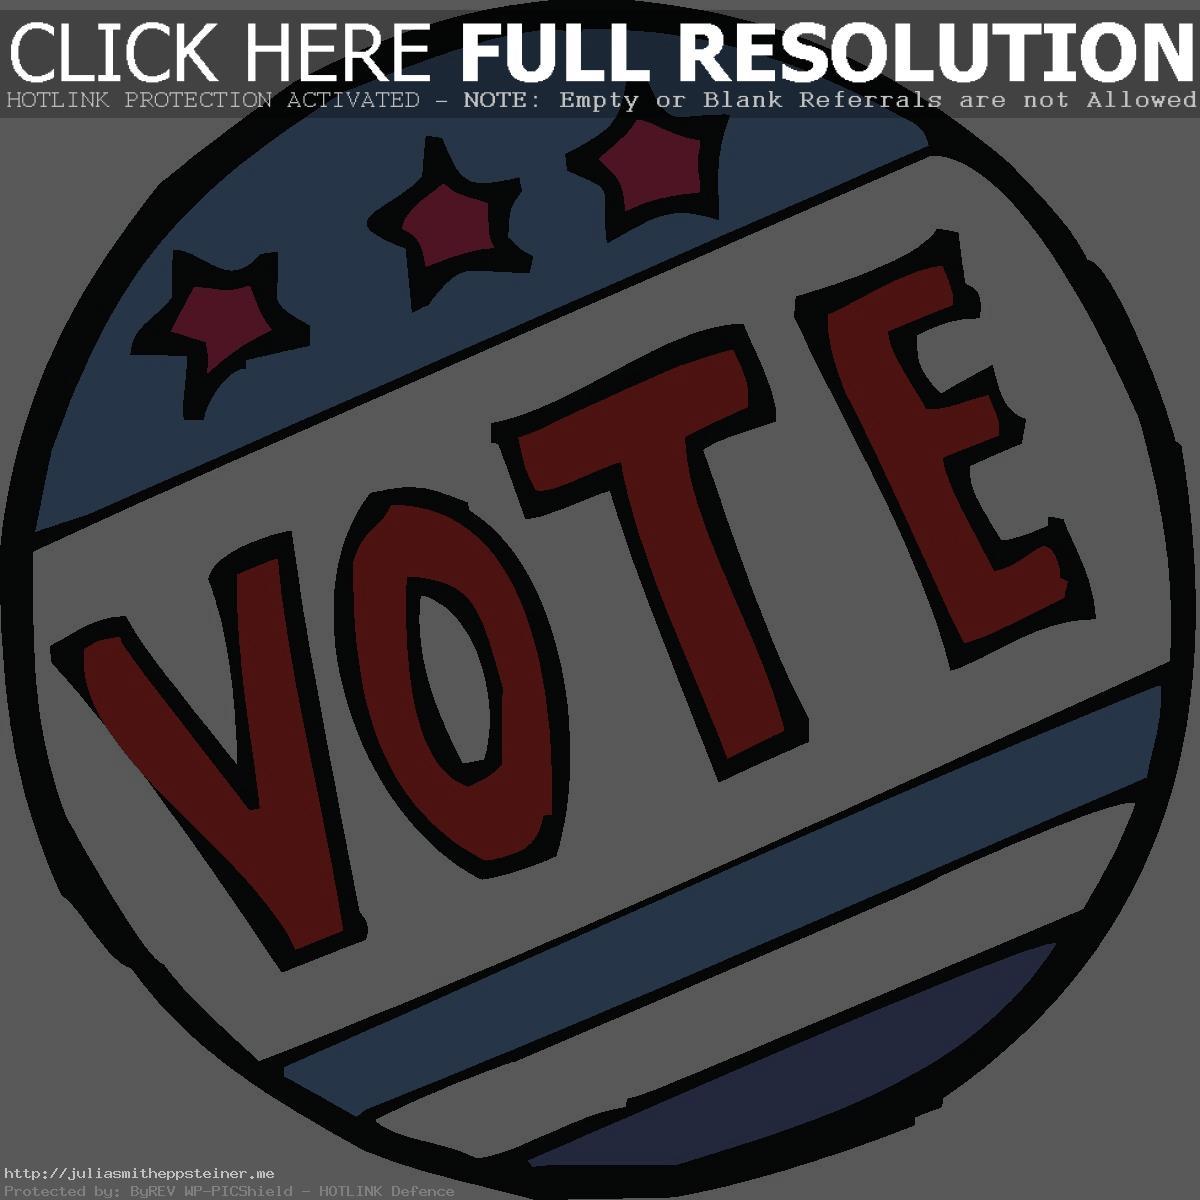 . ClipartLook.com Live 2016 Election Pag-. ClipartLook.com Live 2016 Election Page 5486 Bright Free Vote ClipartLook.com -18